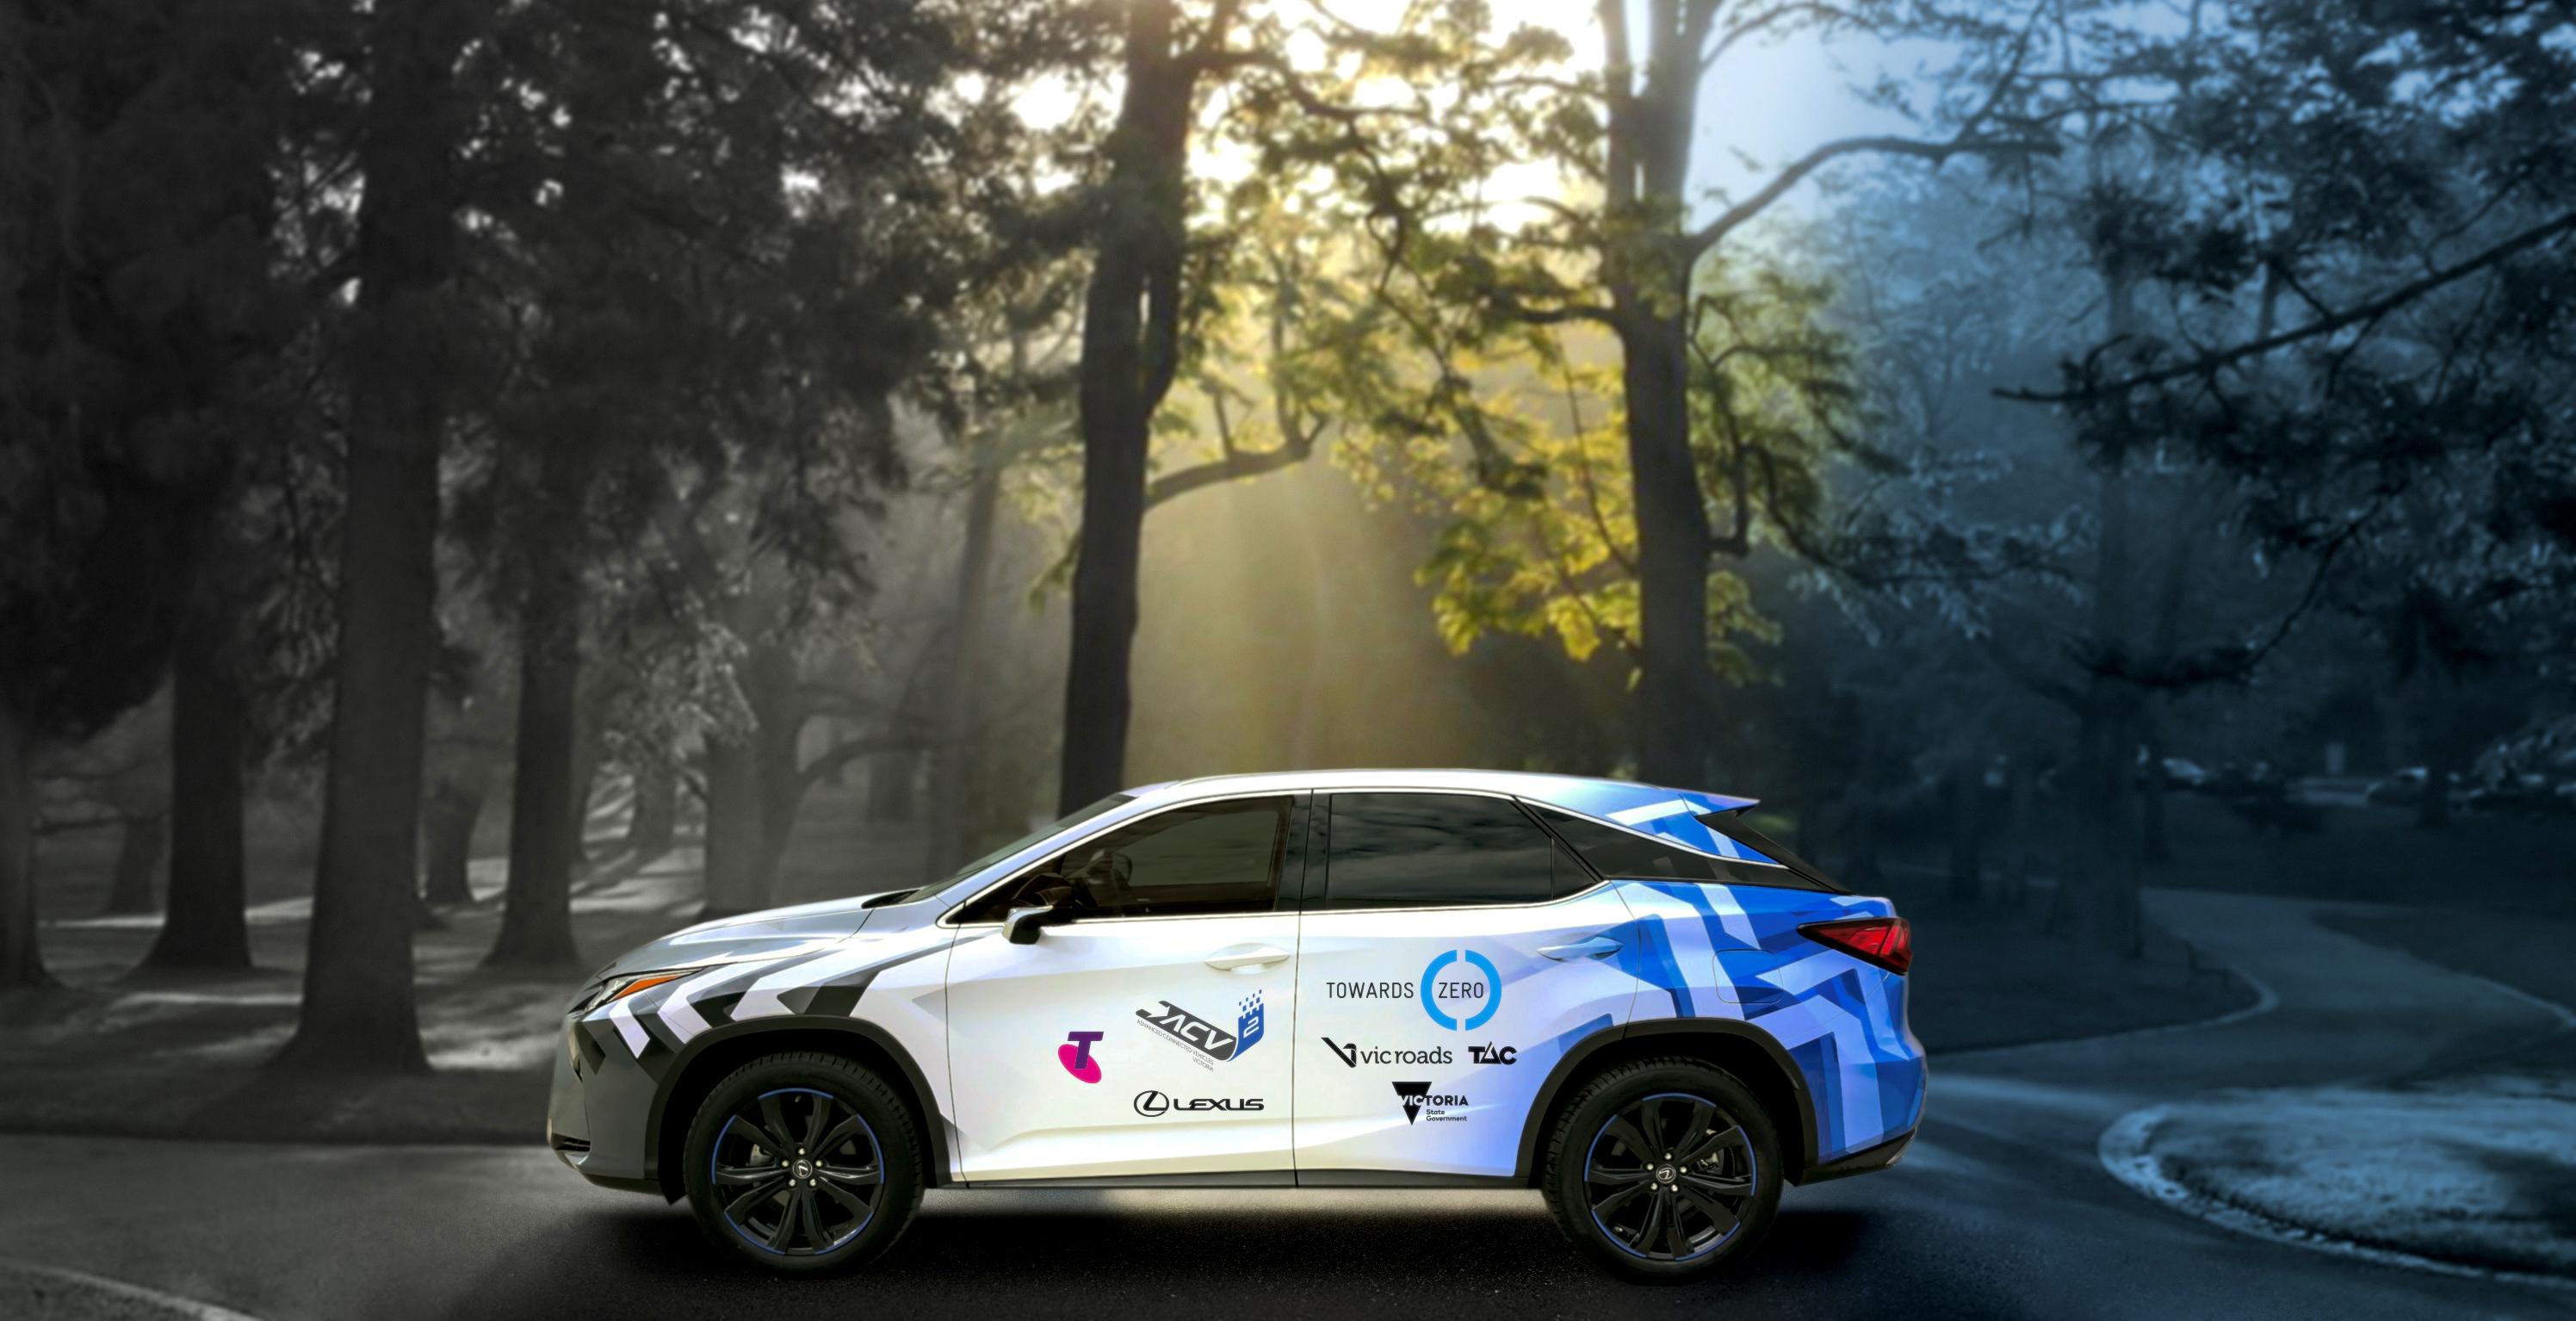 Lexus 'connected vehicles' wrap project